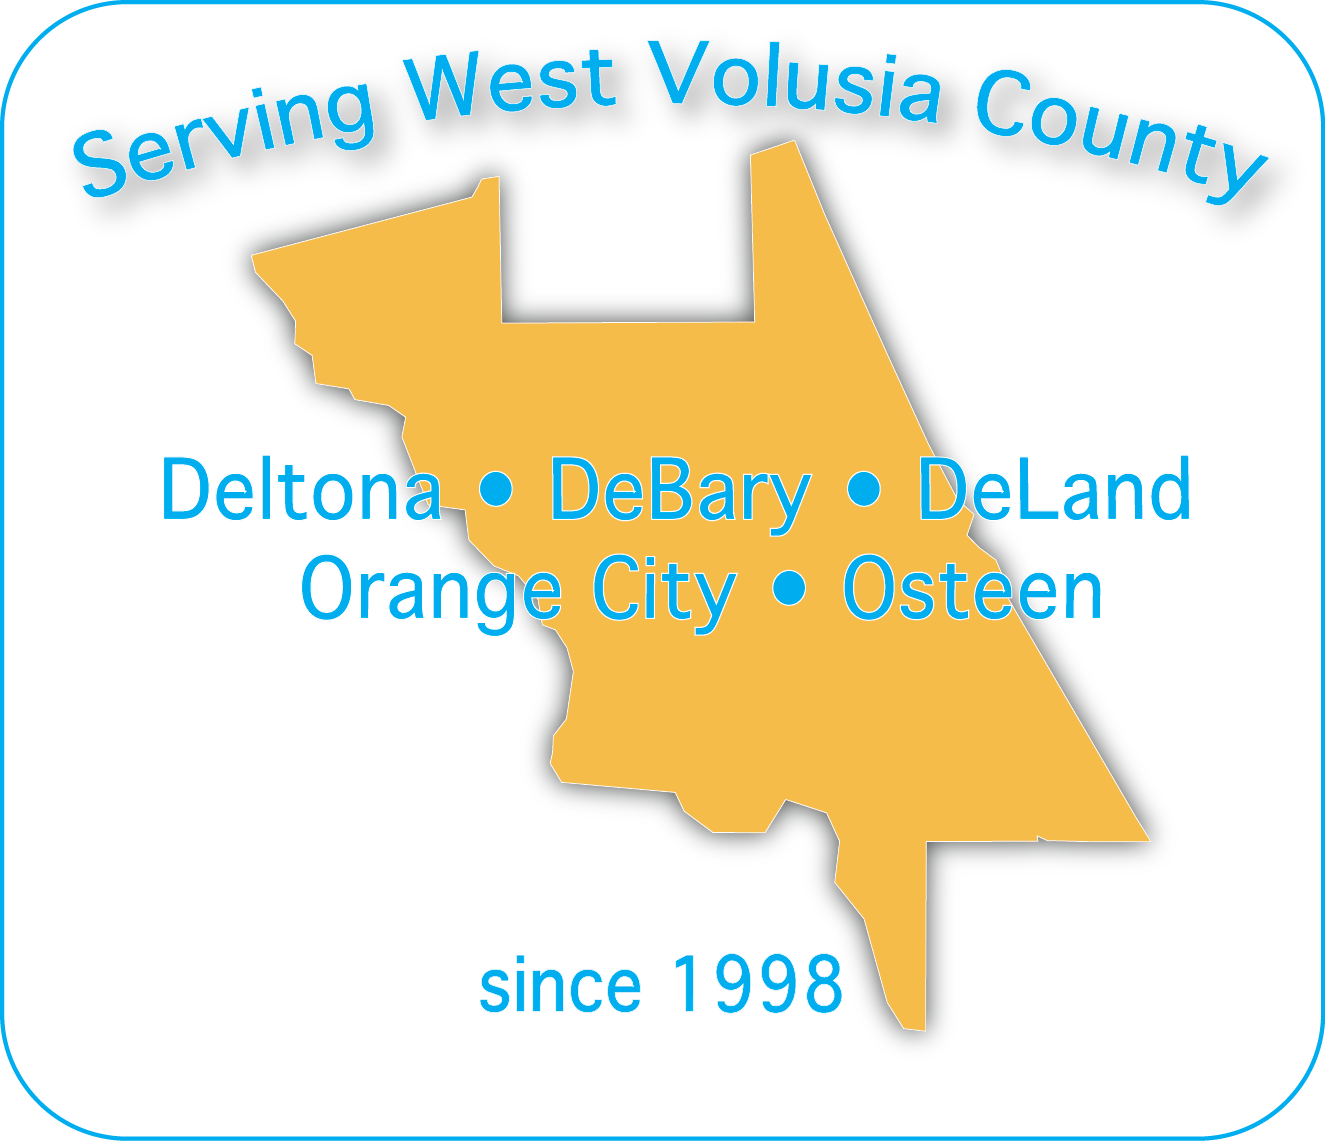 Swim with Becky serves West Volusia communities including Deltona, DeBary, DeLand, Orange City, Osteen.